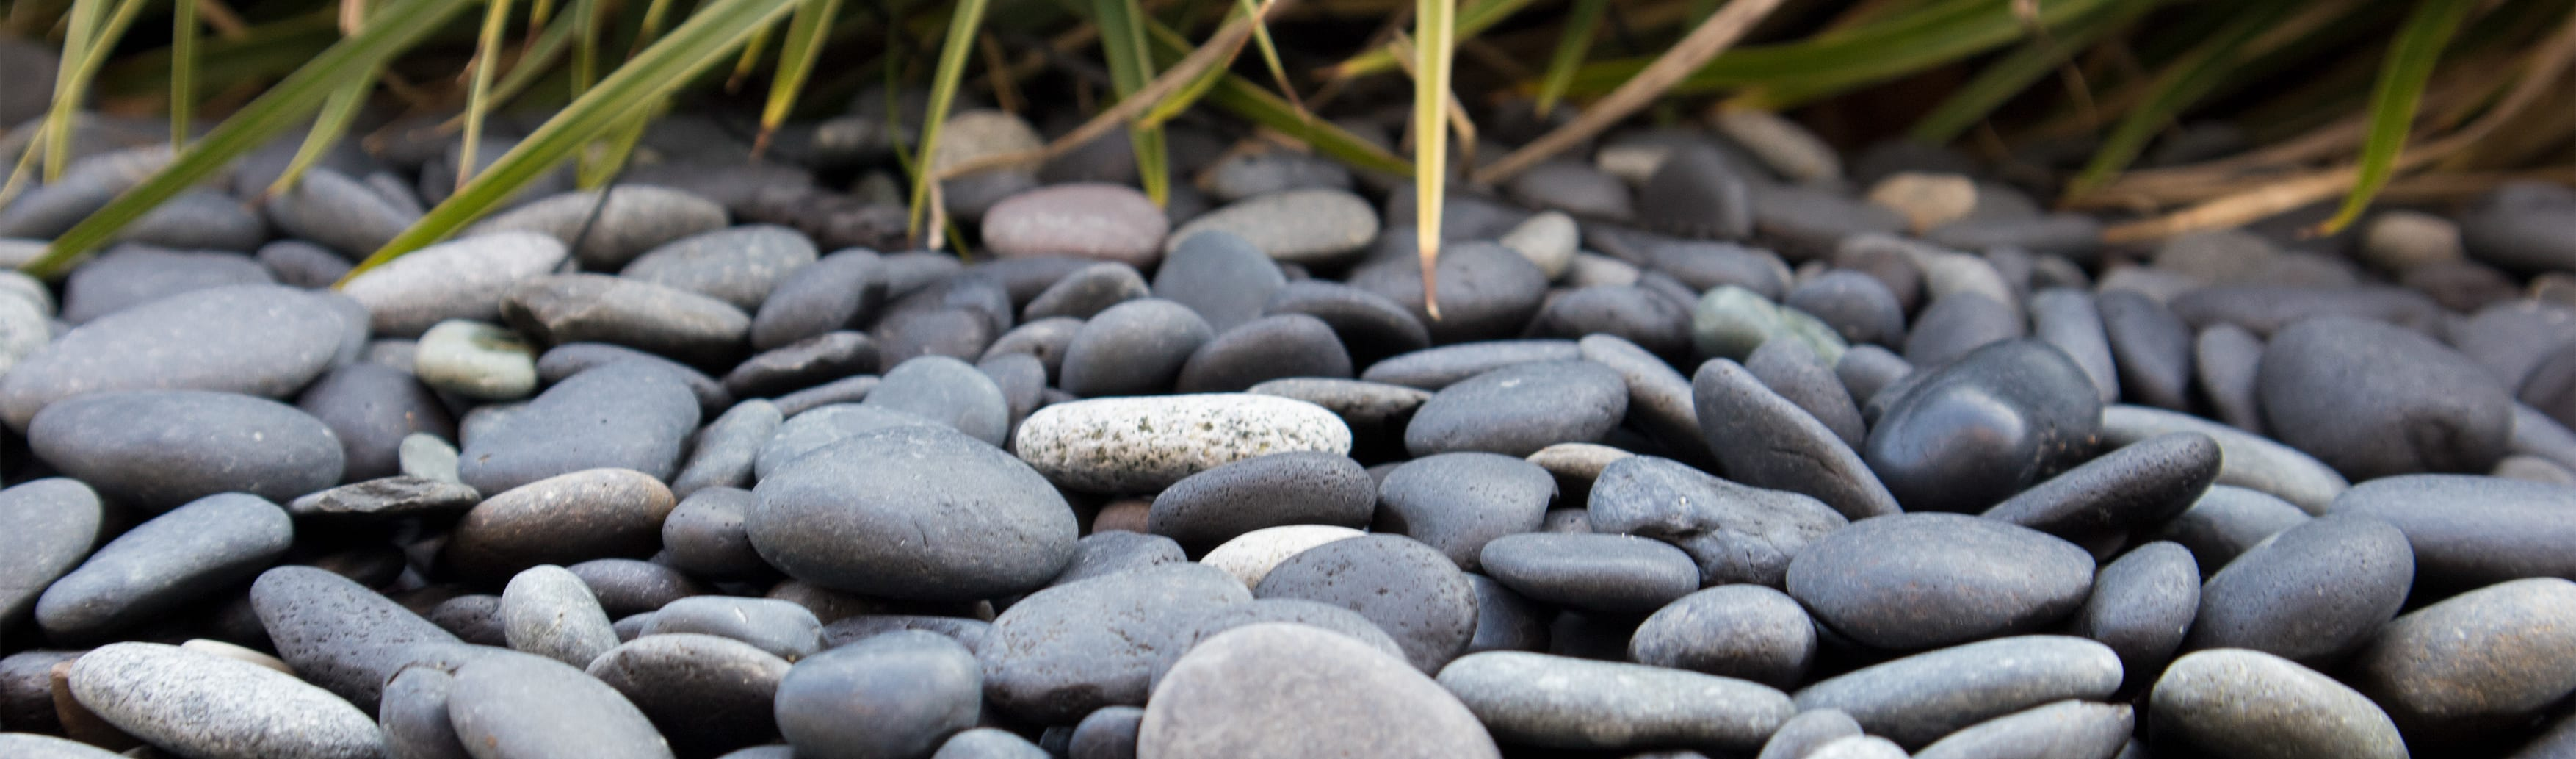 Amagard.com – Gartenmaterialien